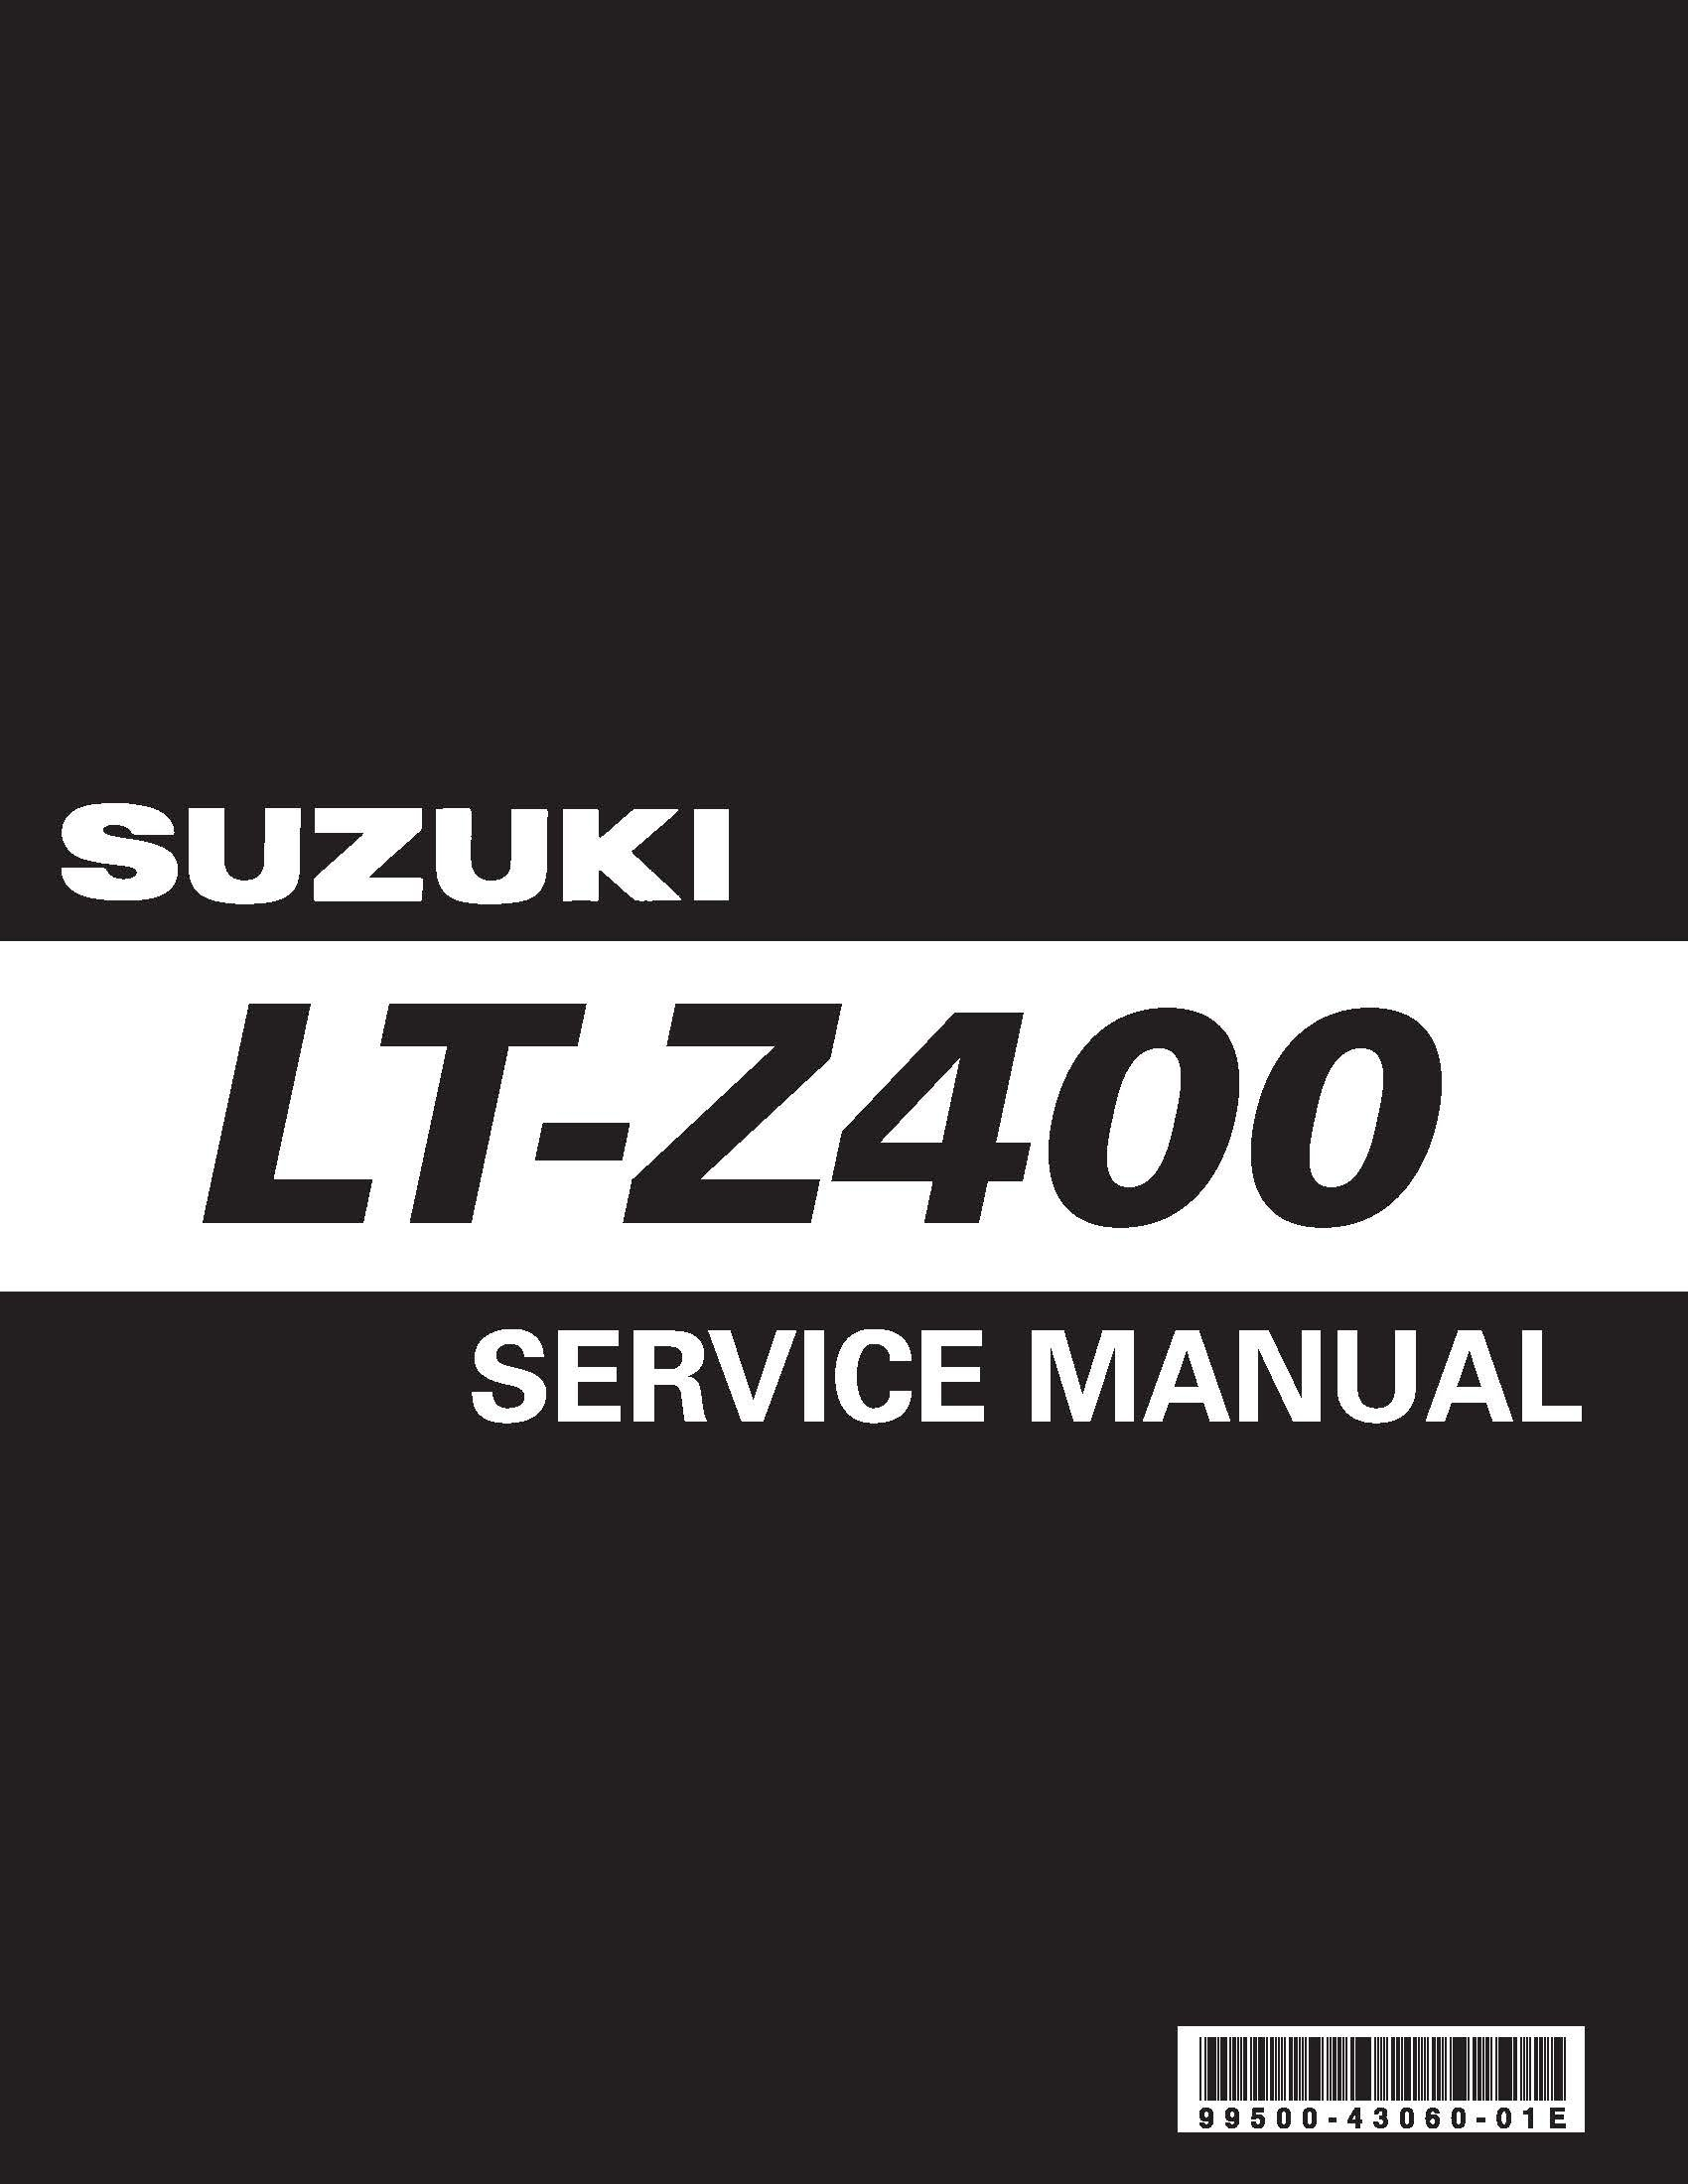 Toyota Tacoma 2015-2018 Service Manual: Diagnostic Trouble Code Chart